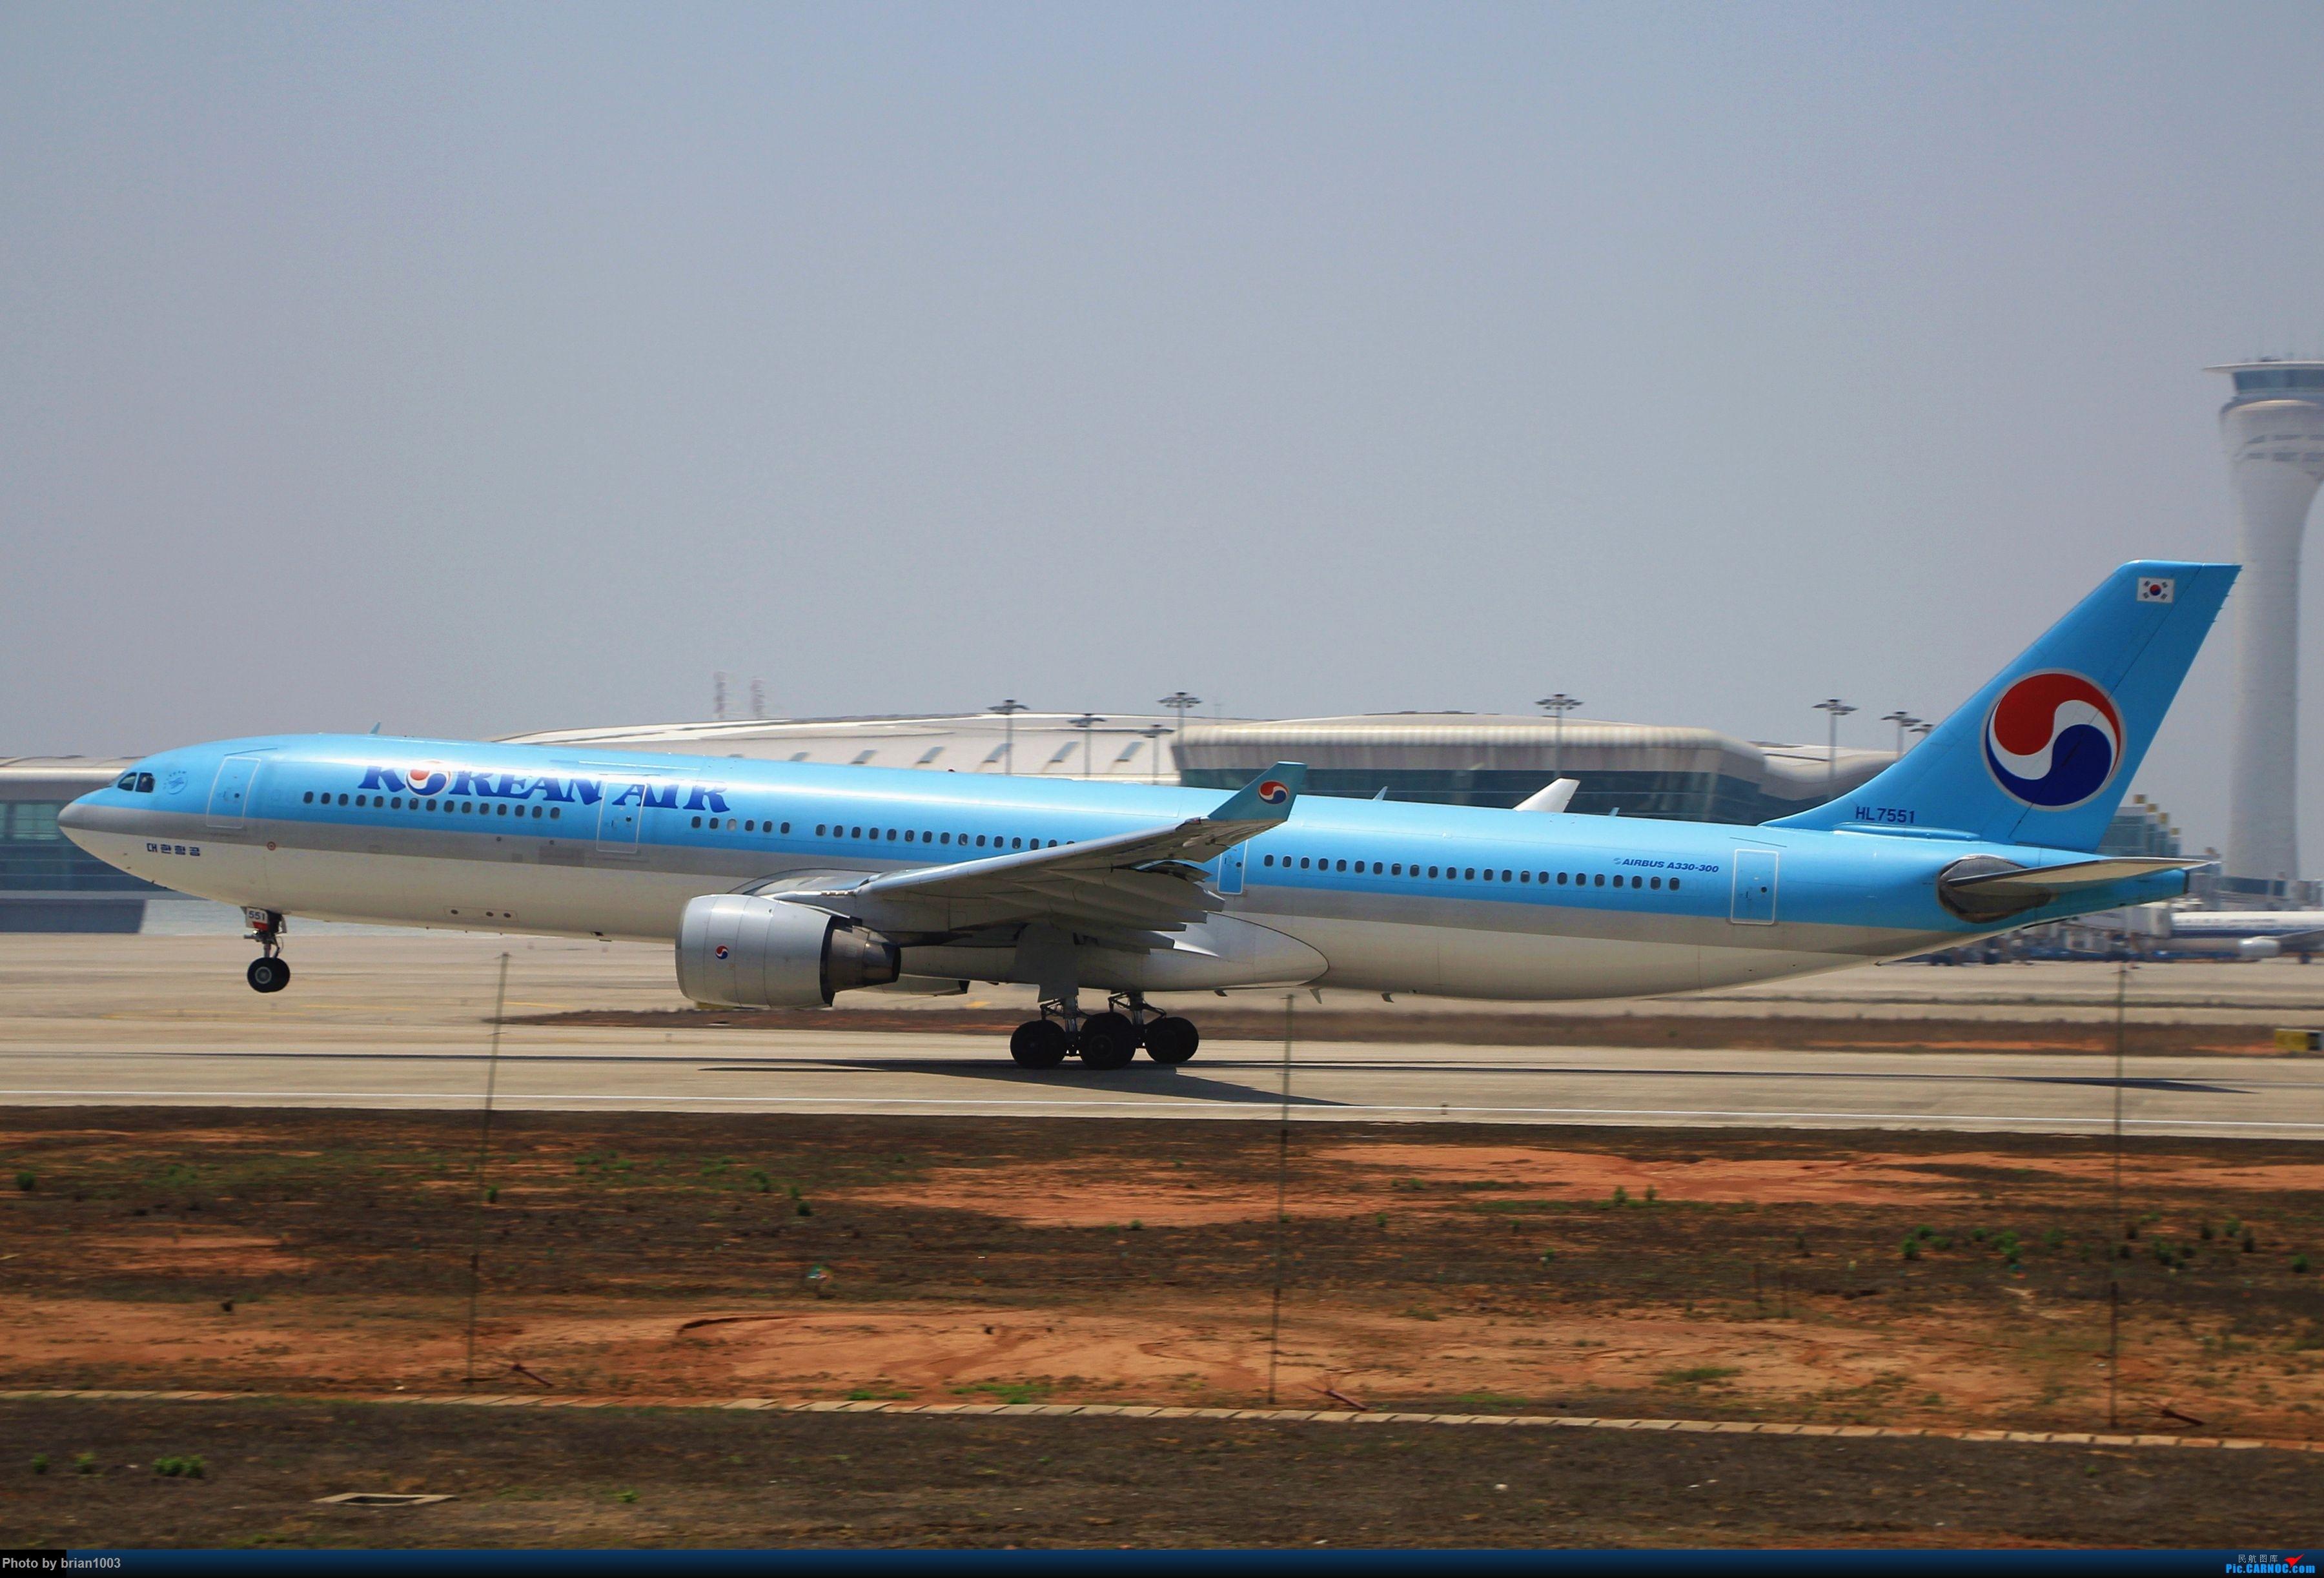 Re:[原创]WUH武汉天河机场拍机之喜迎酷航788和偶遇某其他飞机 AIRBUS A330-300 HL7551